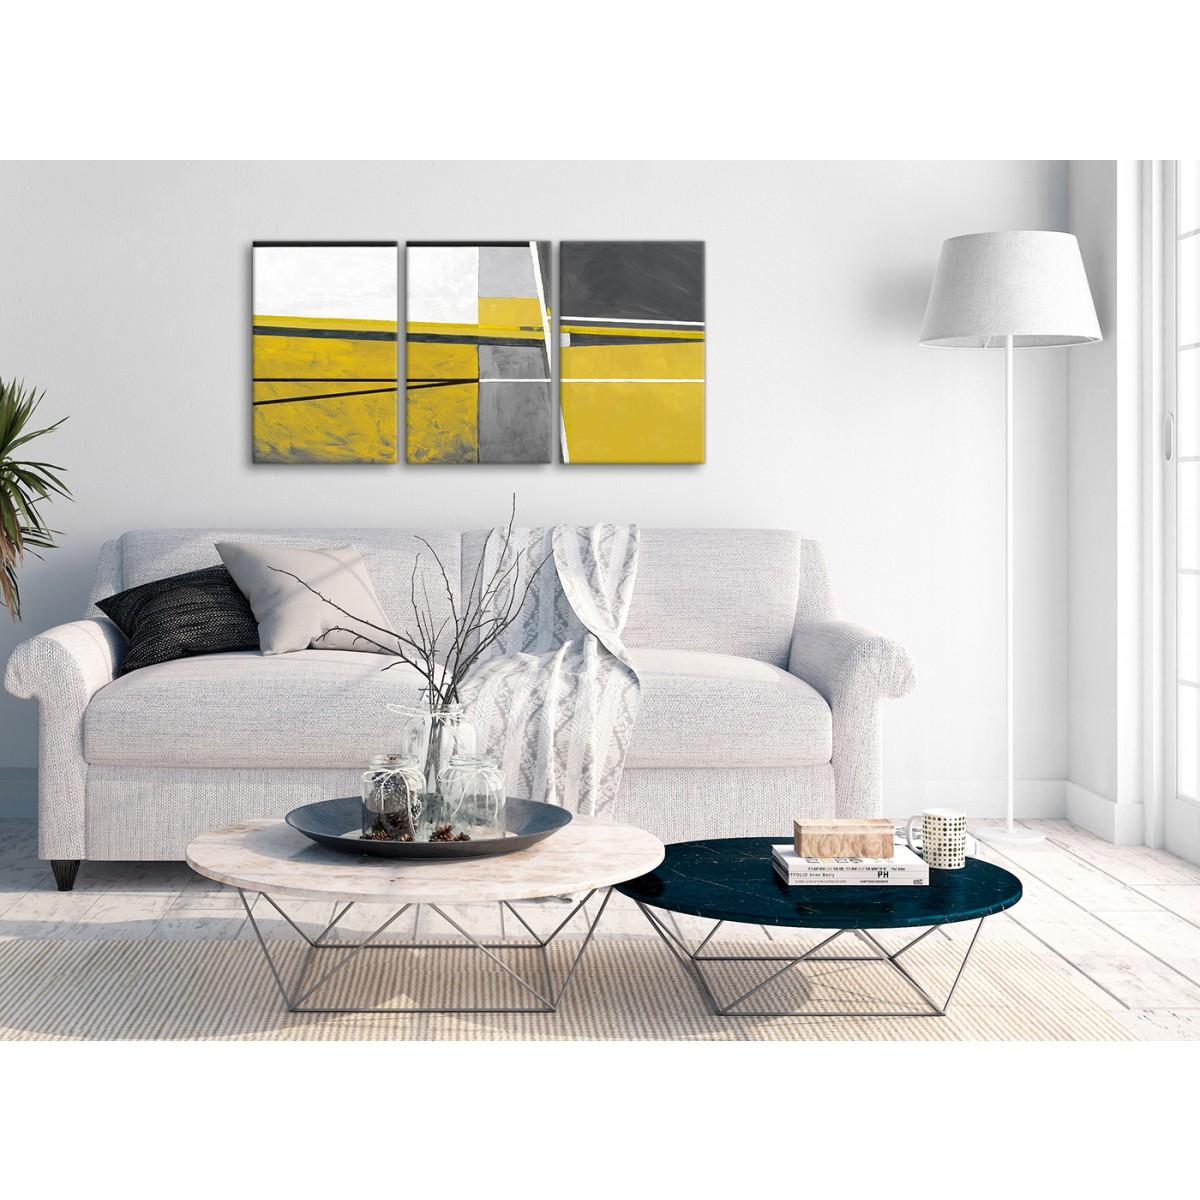 Mustard Yellow Kitchen Decor: 3 Panel Mustard Yellow Grey Painting Hallway Canvas